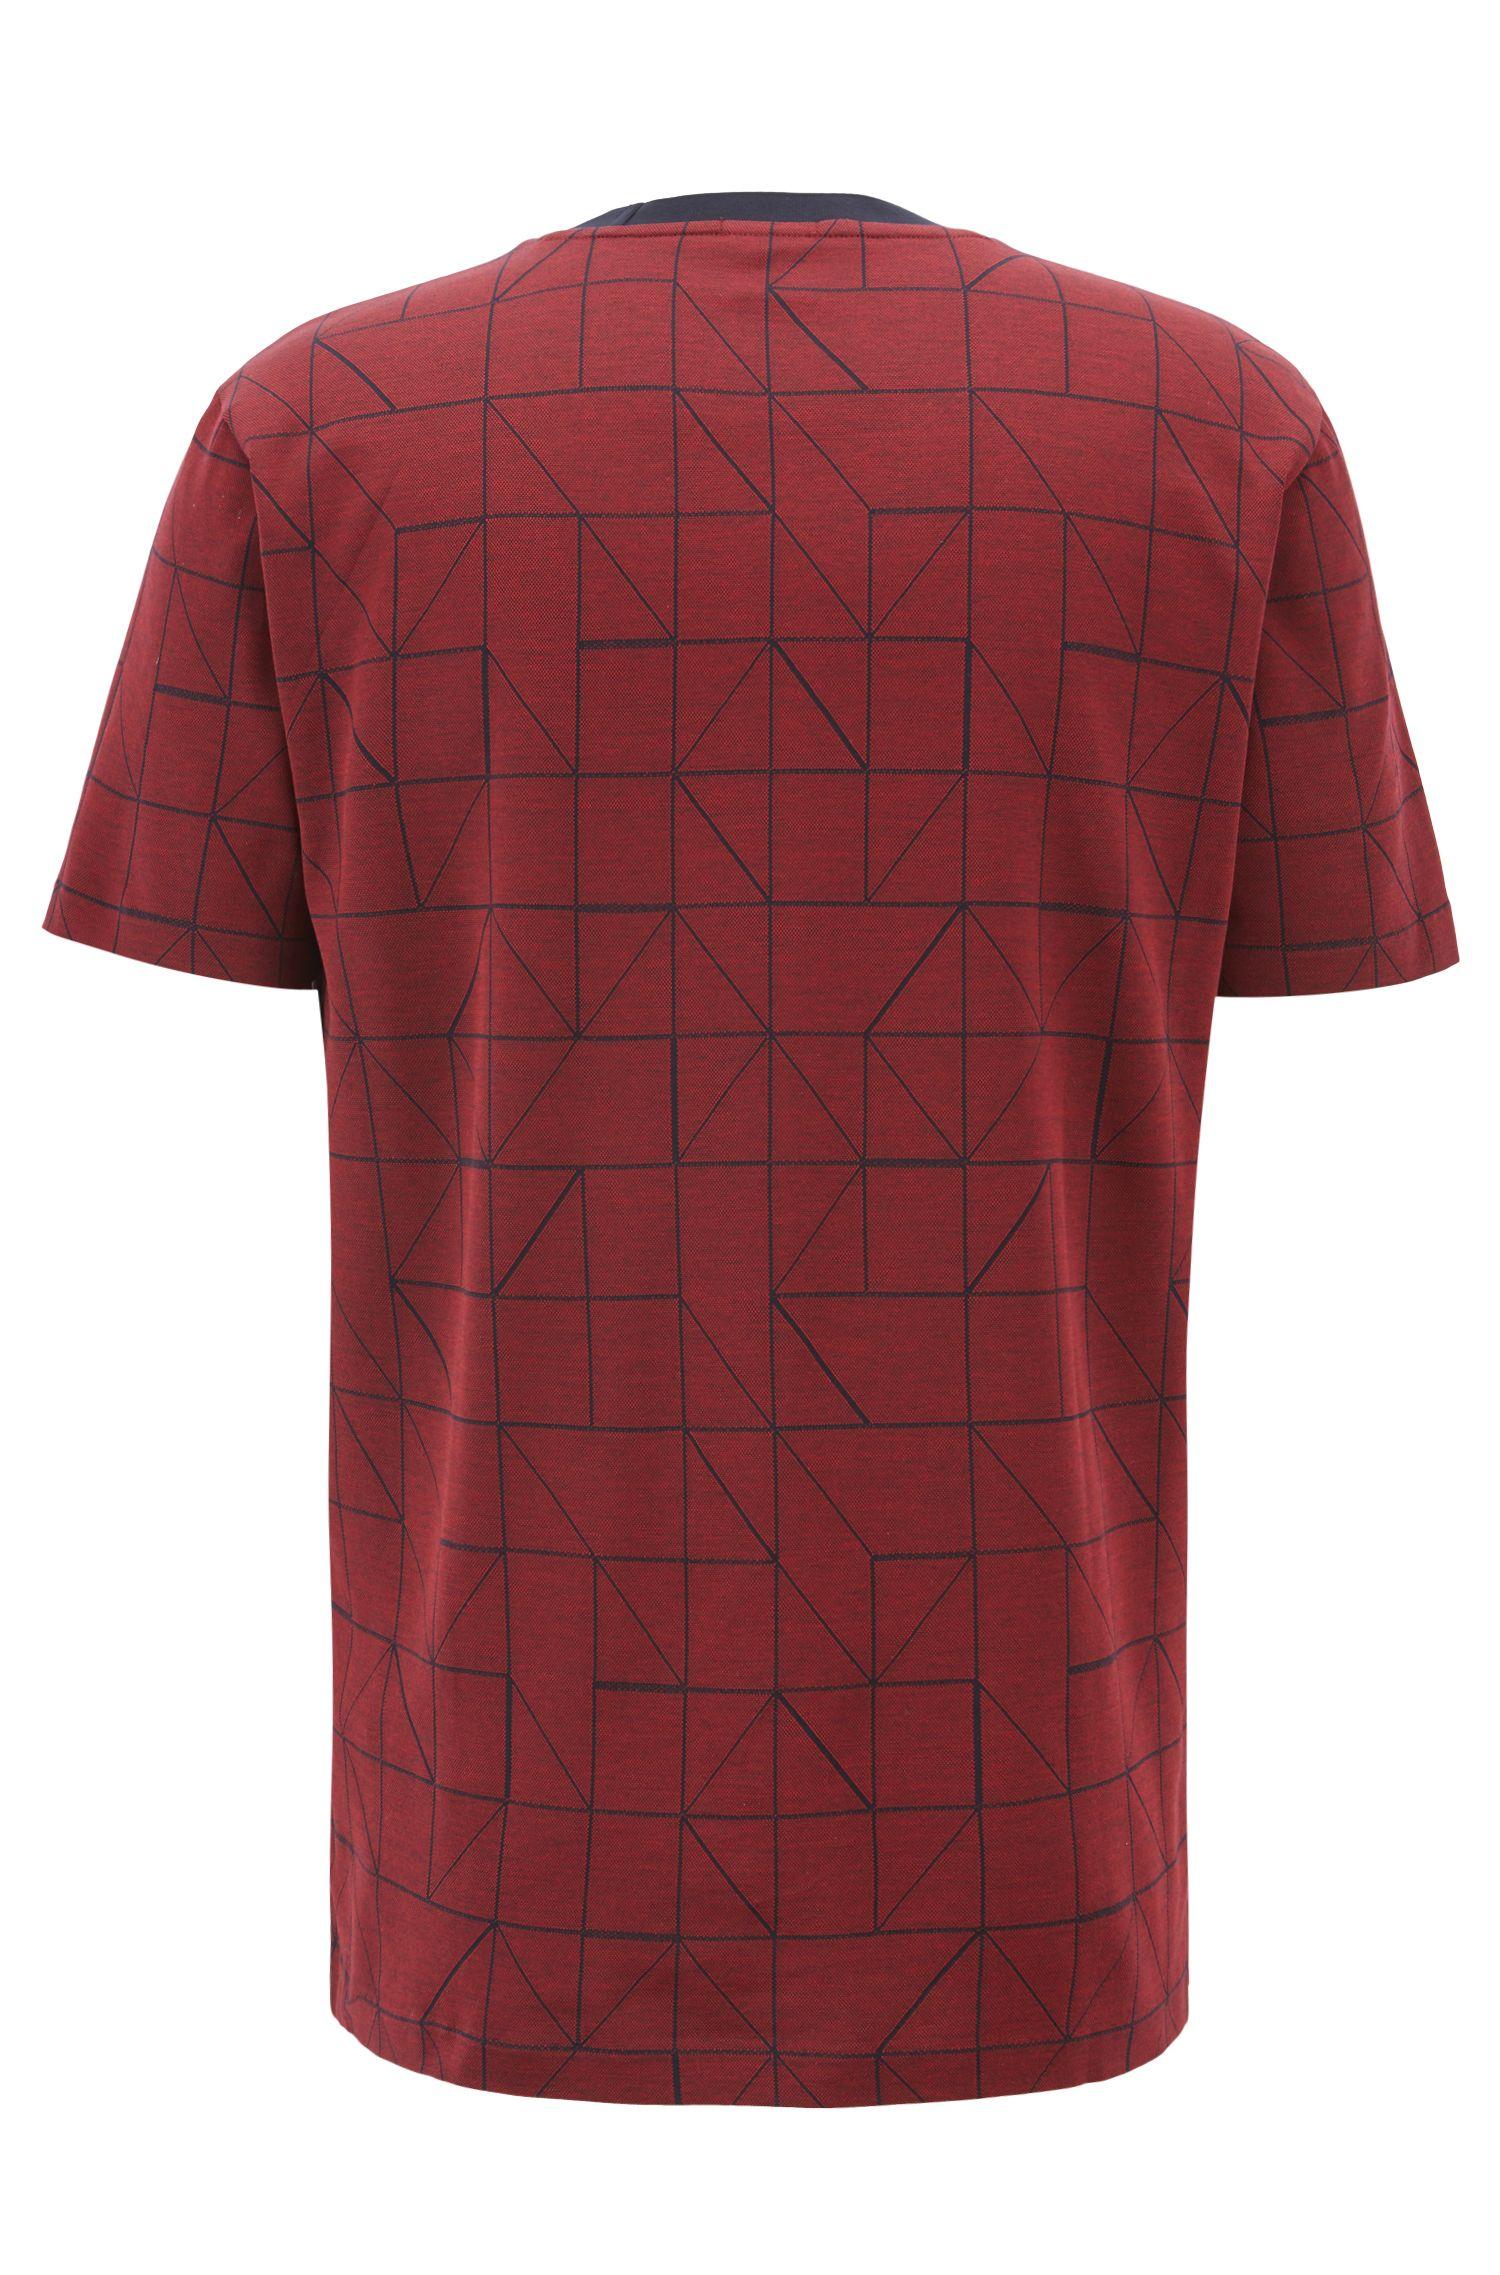 T-Shirt aus merzerisiertem Baumwoll-Jacquard mit Bauhaus-Muster, Dunkelrot